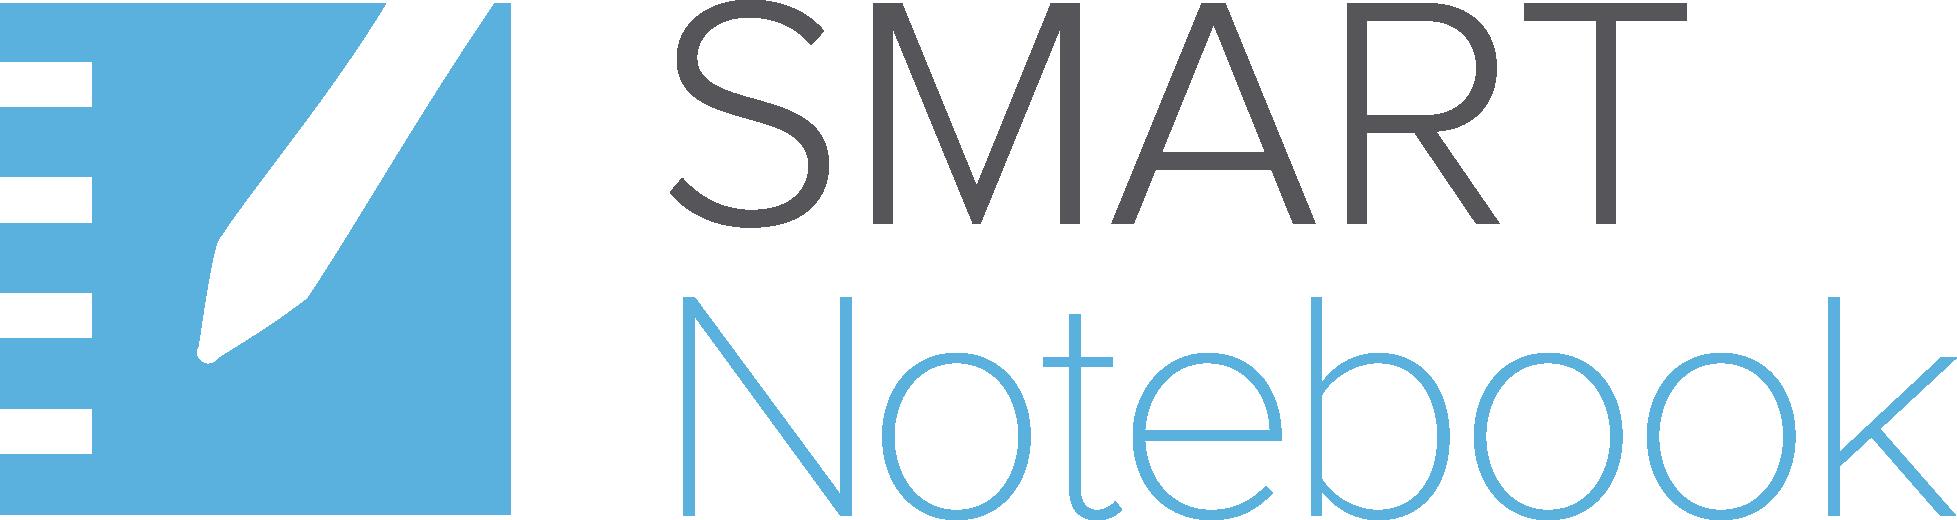 SMART Notebook 20 is coming!!!